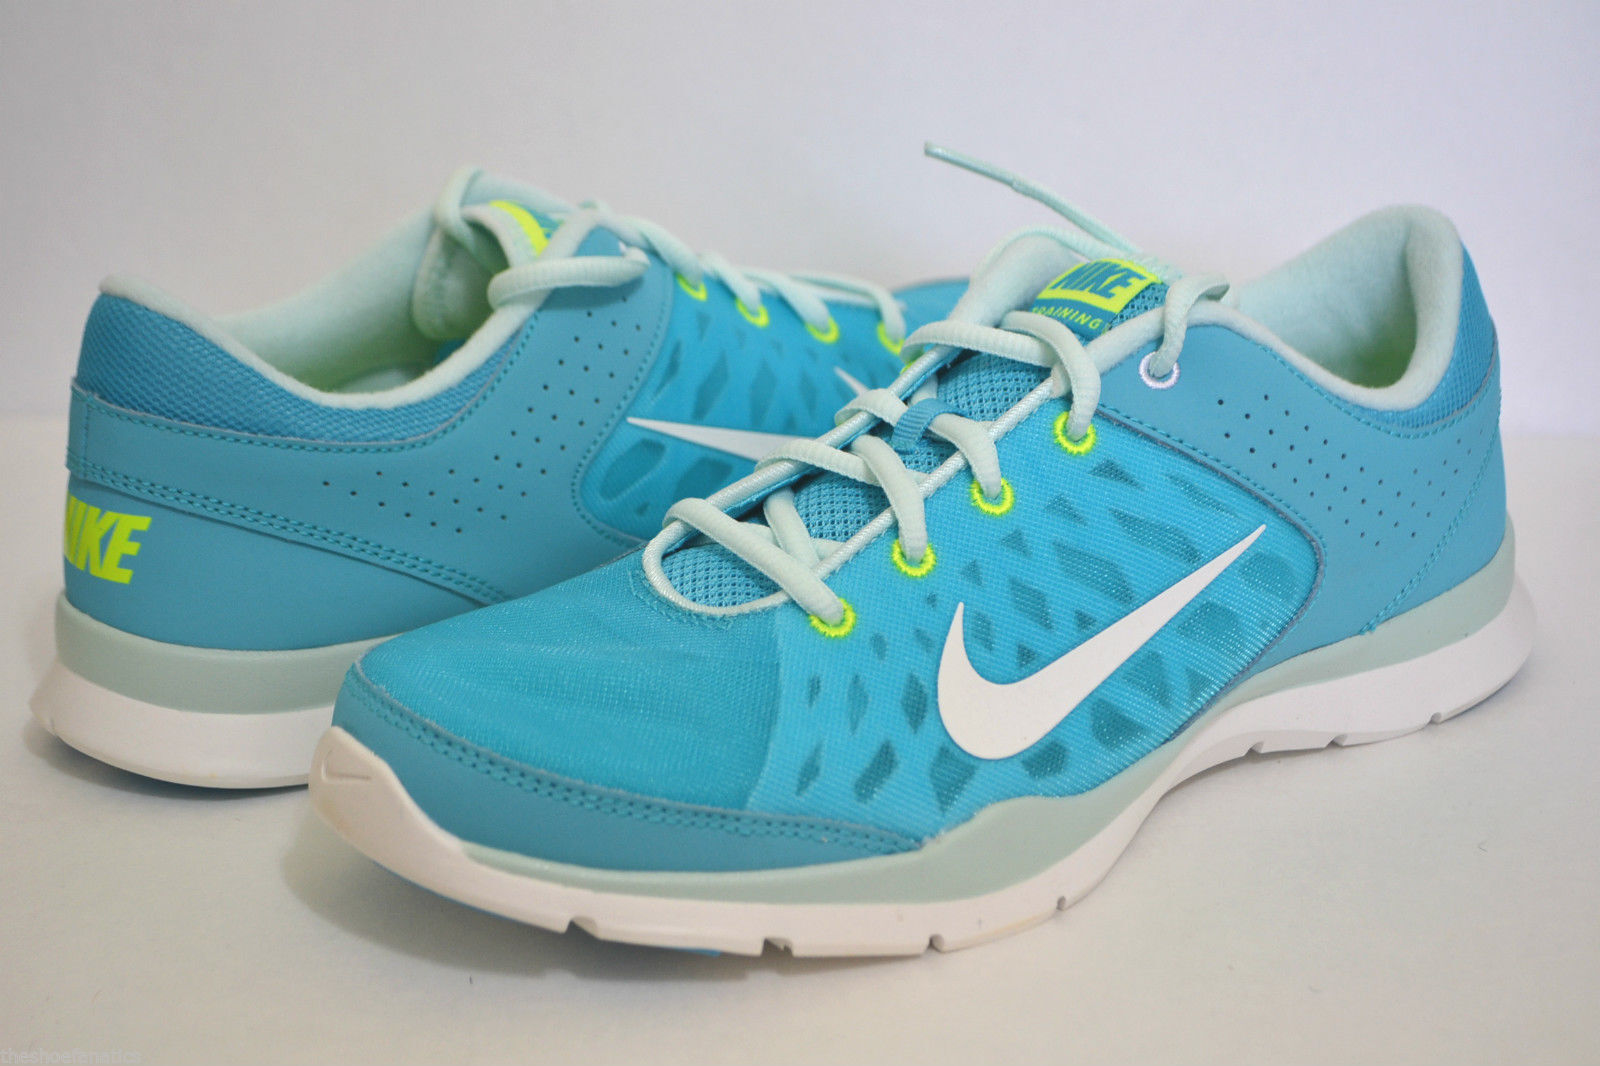 Nike femmes  Flex Trainer Chaussures 3 Gamma Bleu Trainers Chaussures Trainer ea3fbf